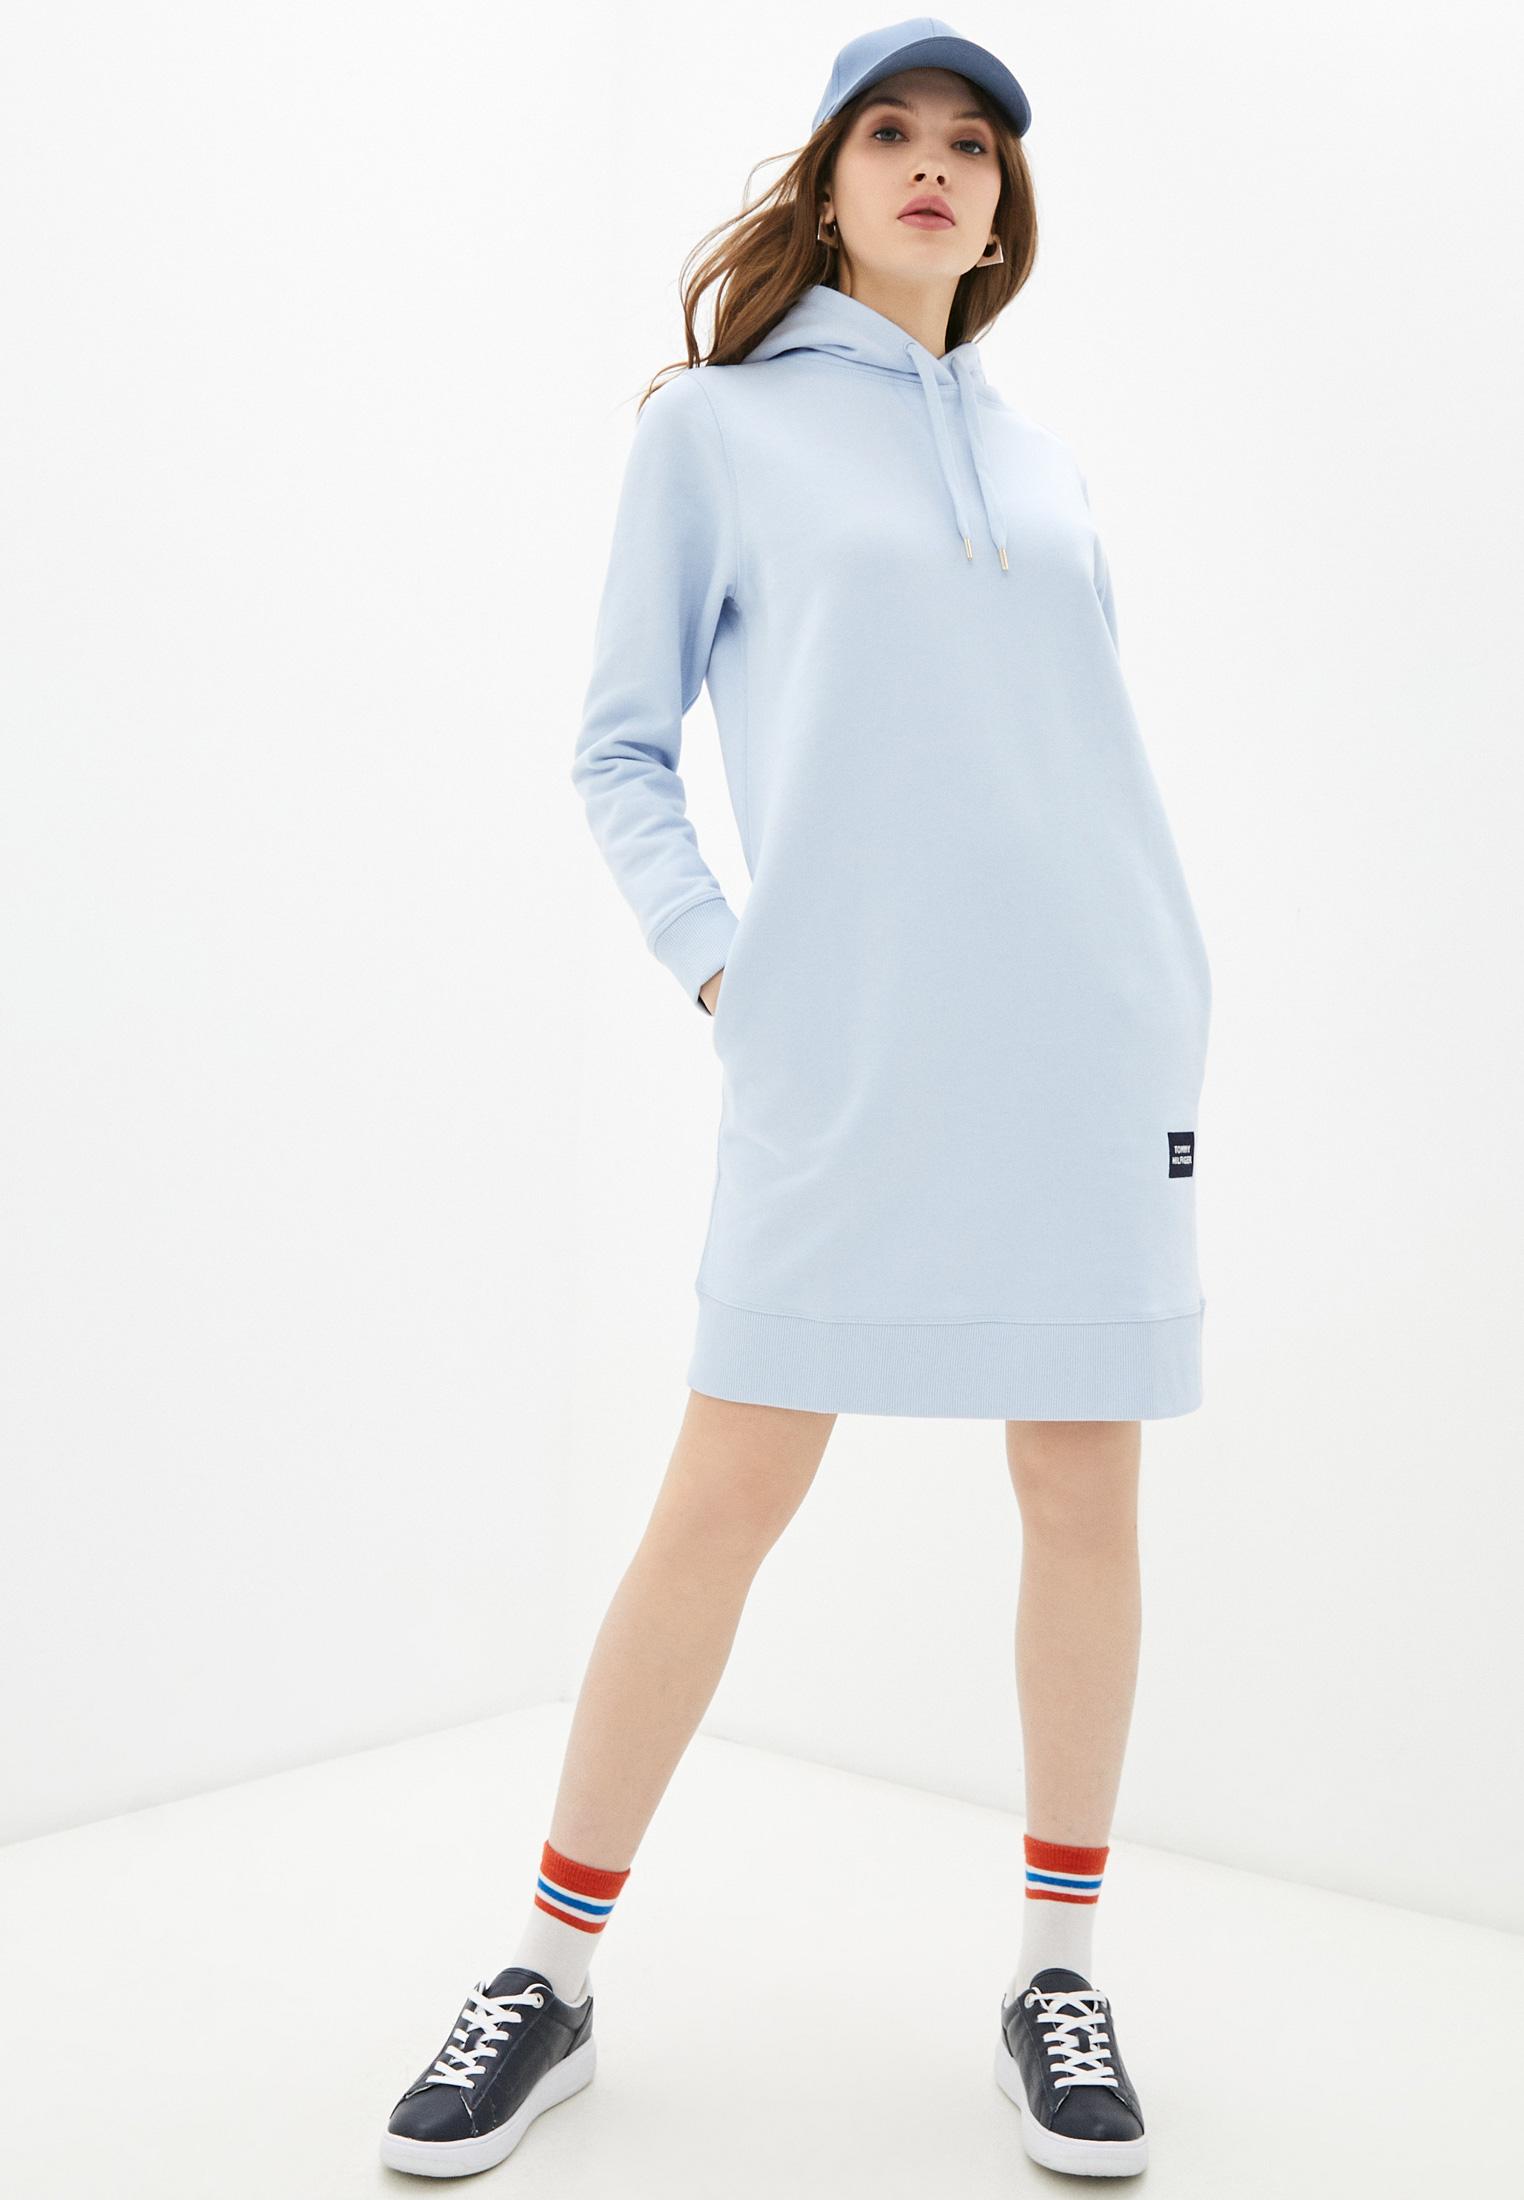 Платье Tommy Hilfiger (Томми Хилфигер) WW0WW30365: изображение 2